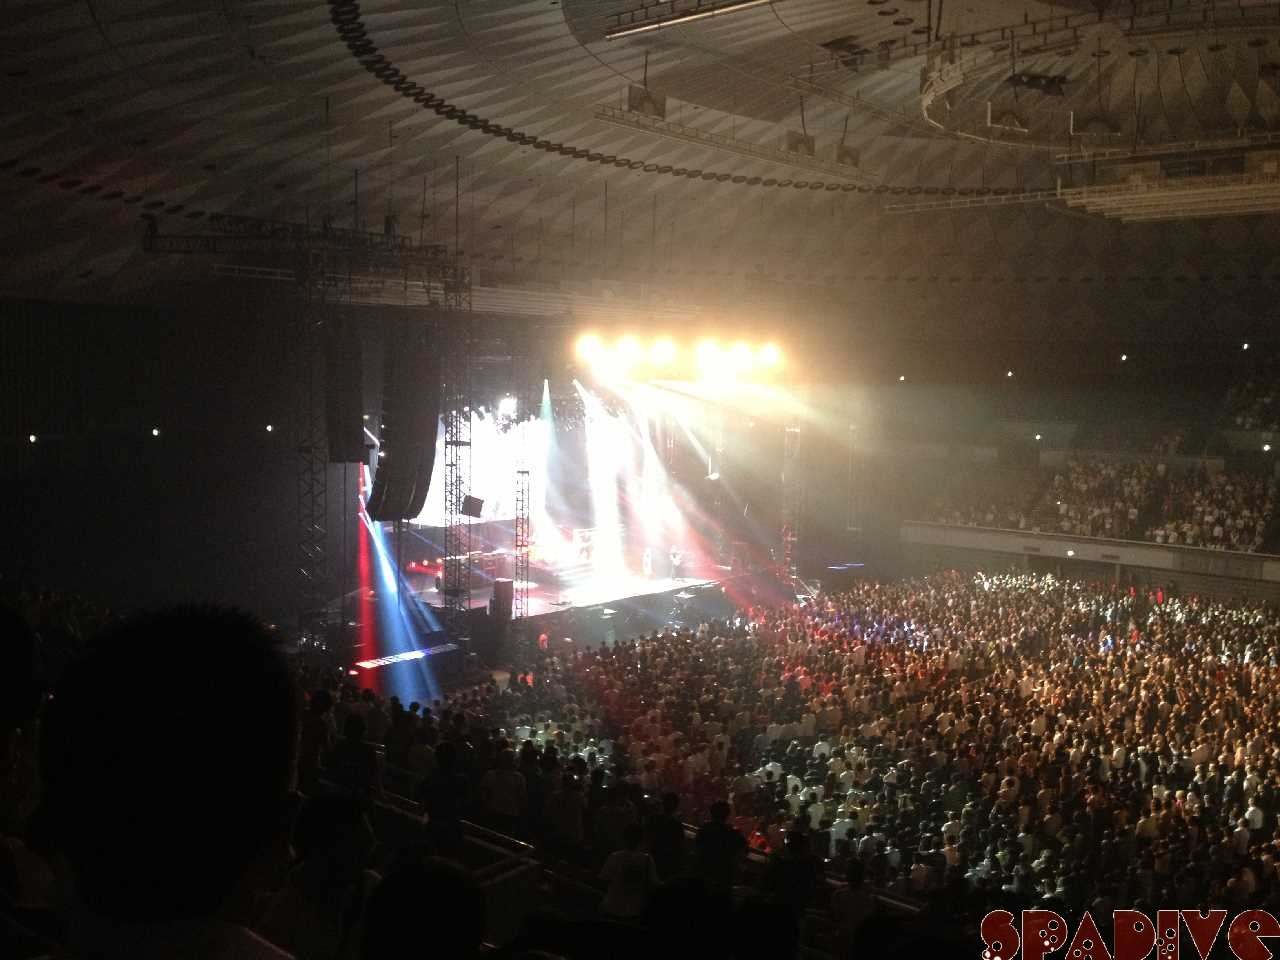 Van Halenライブ JapanTour2013 6/24大阪中央体育館|船舶免許更新